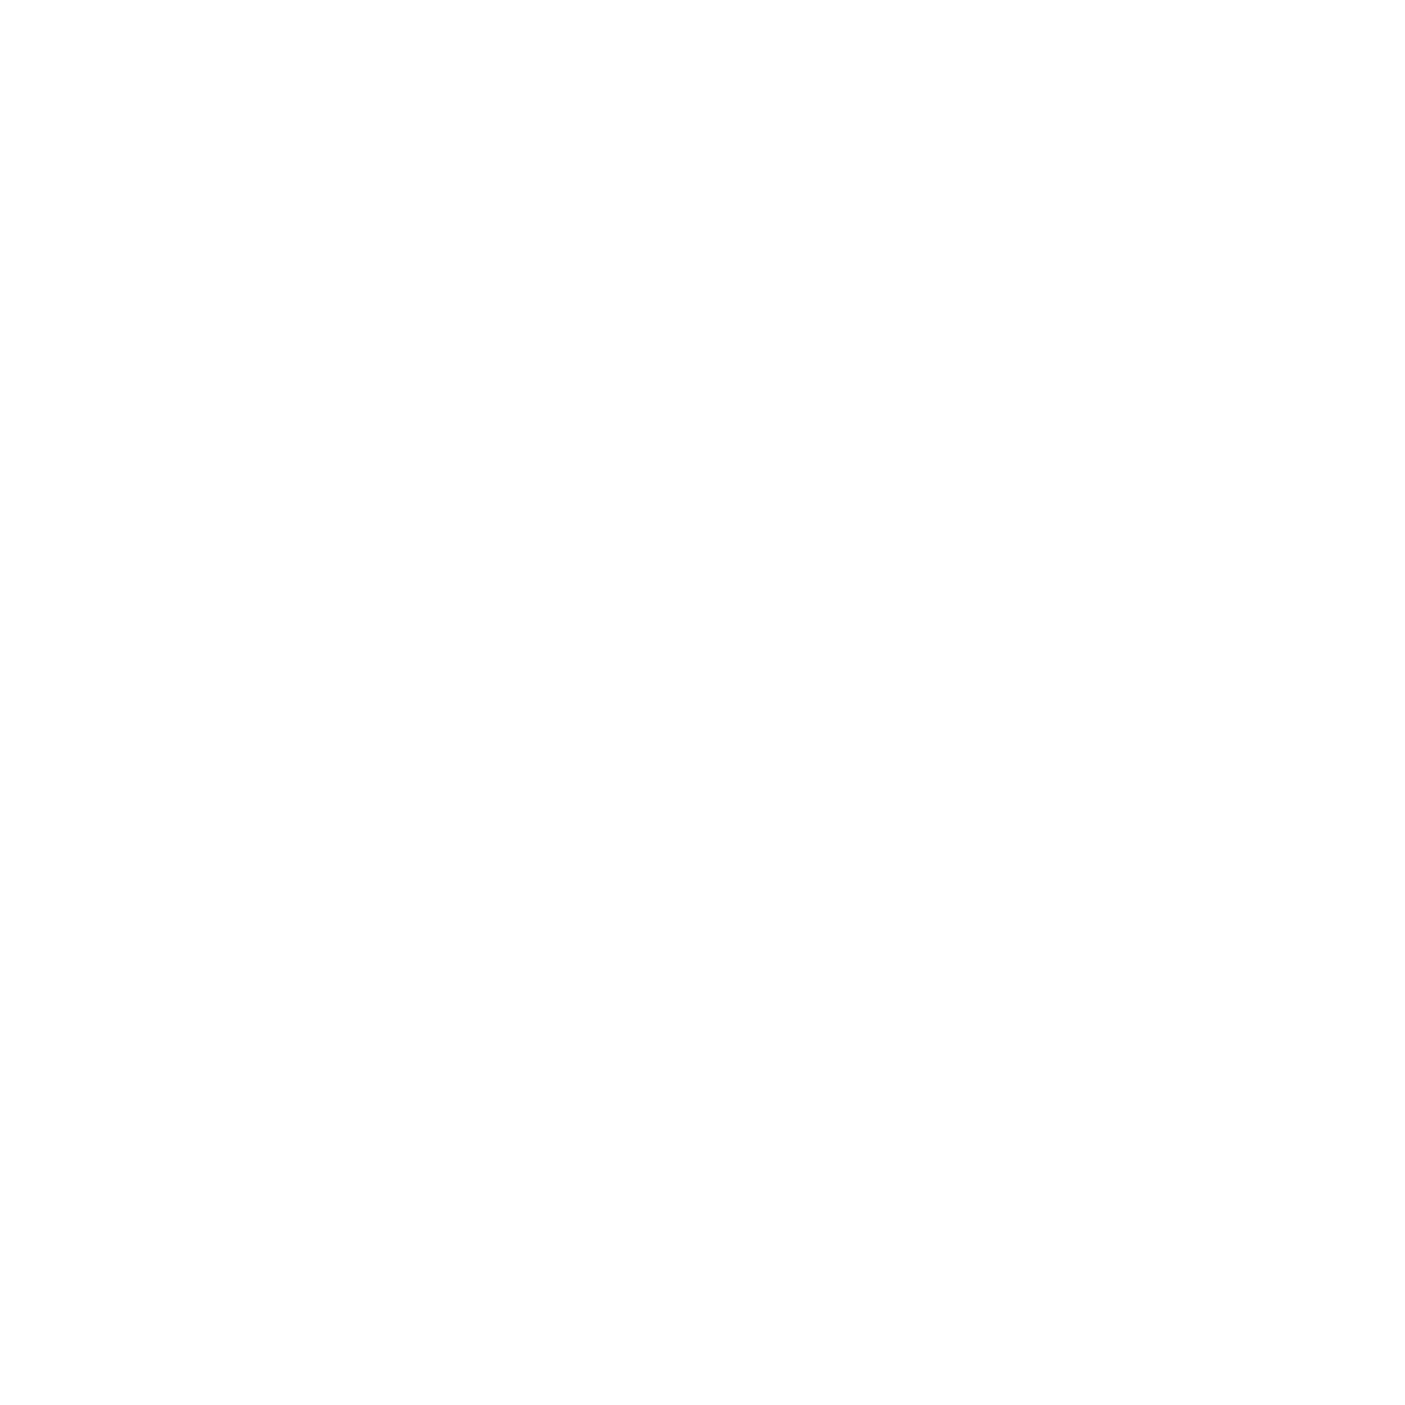 Bodega Negra